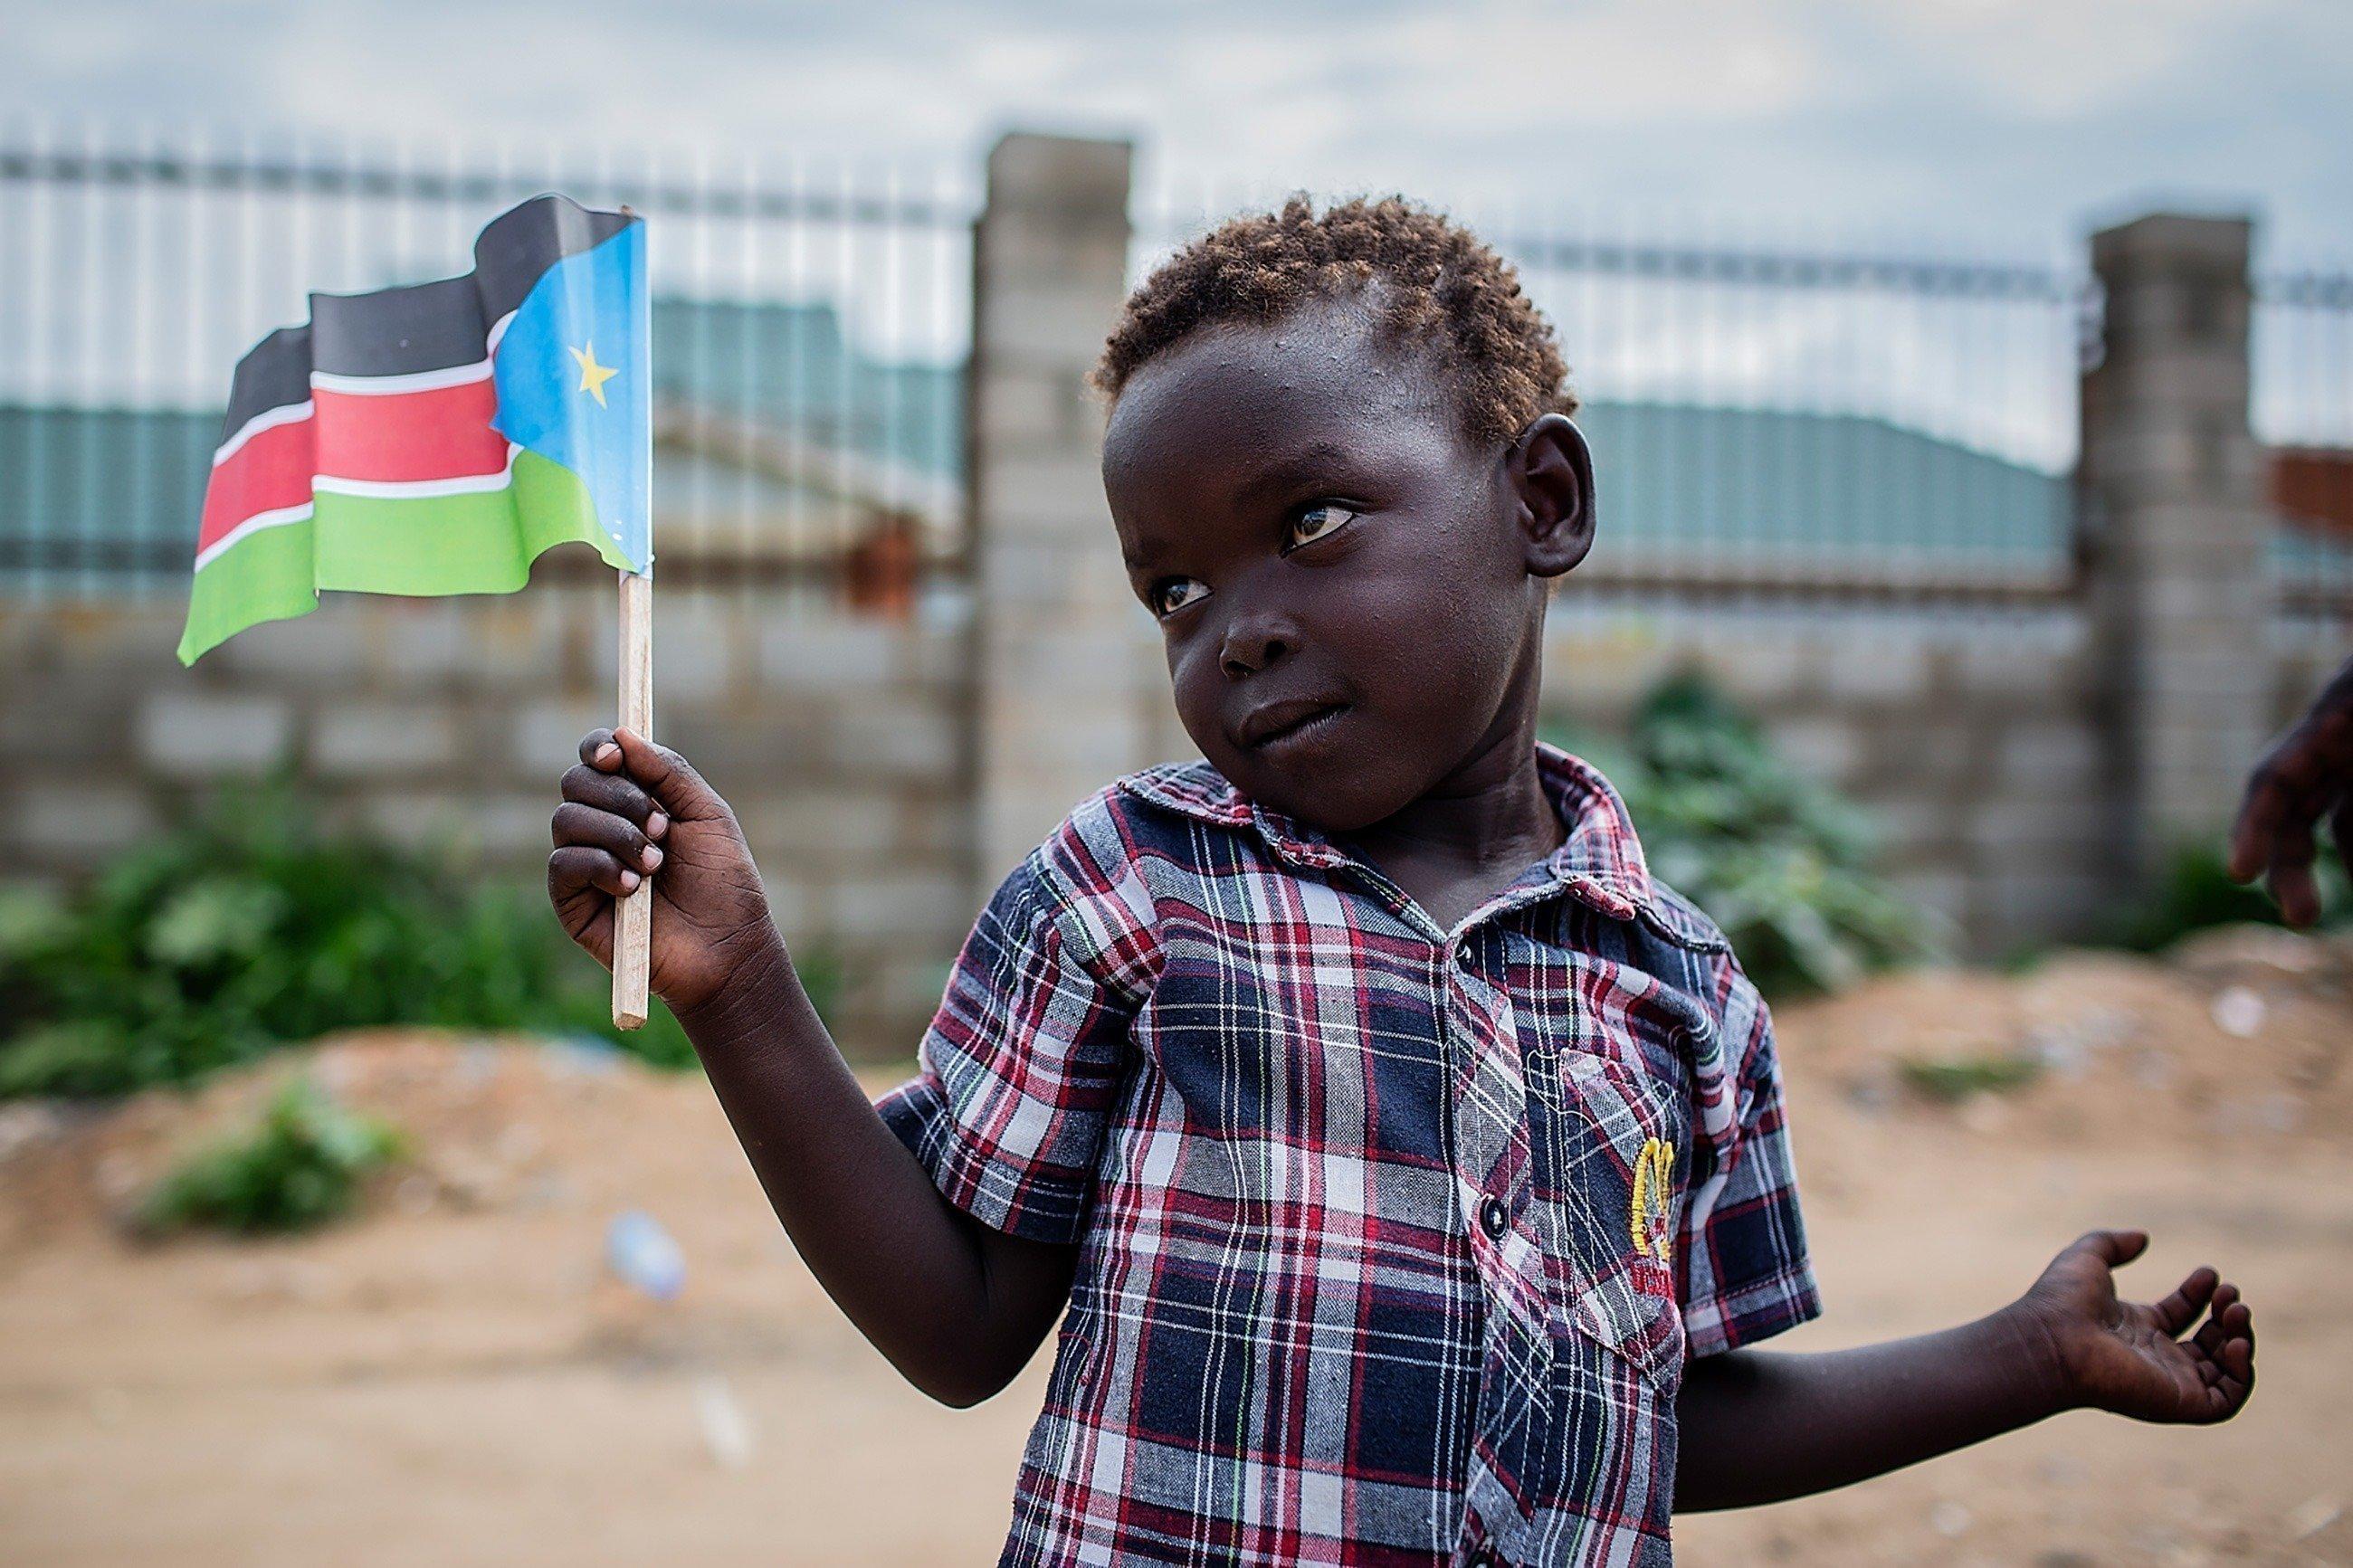 Un petit garçon avec un drapeau africain.